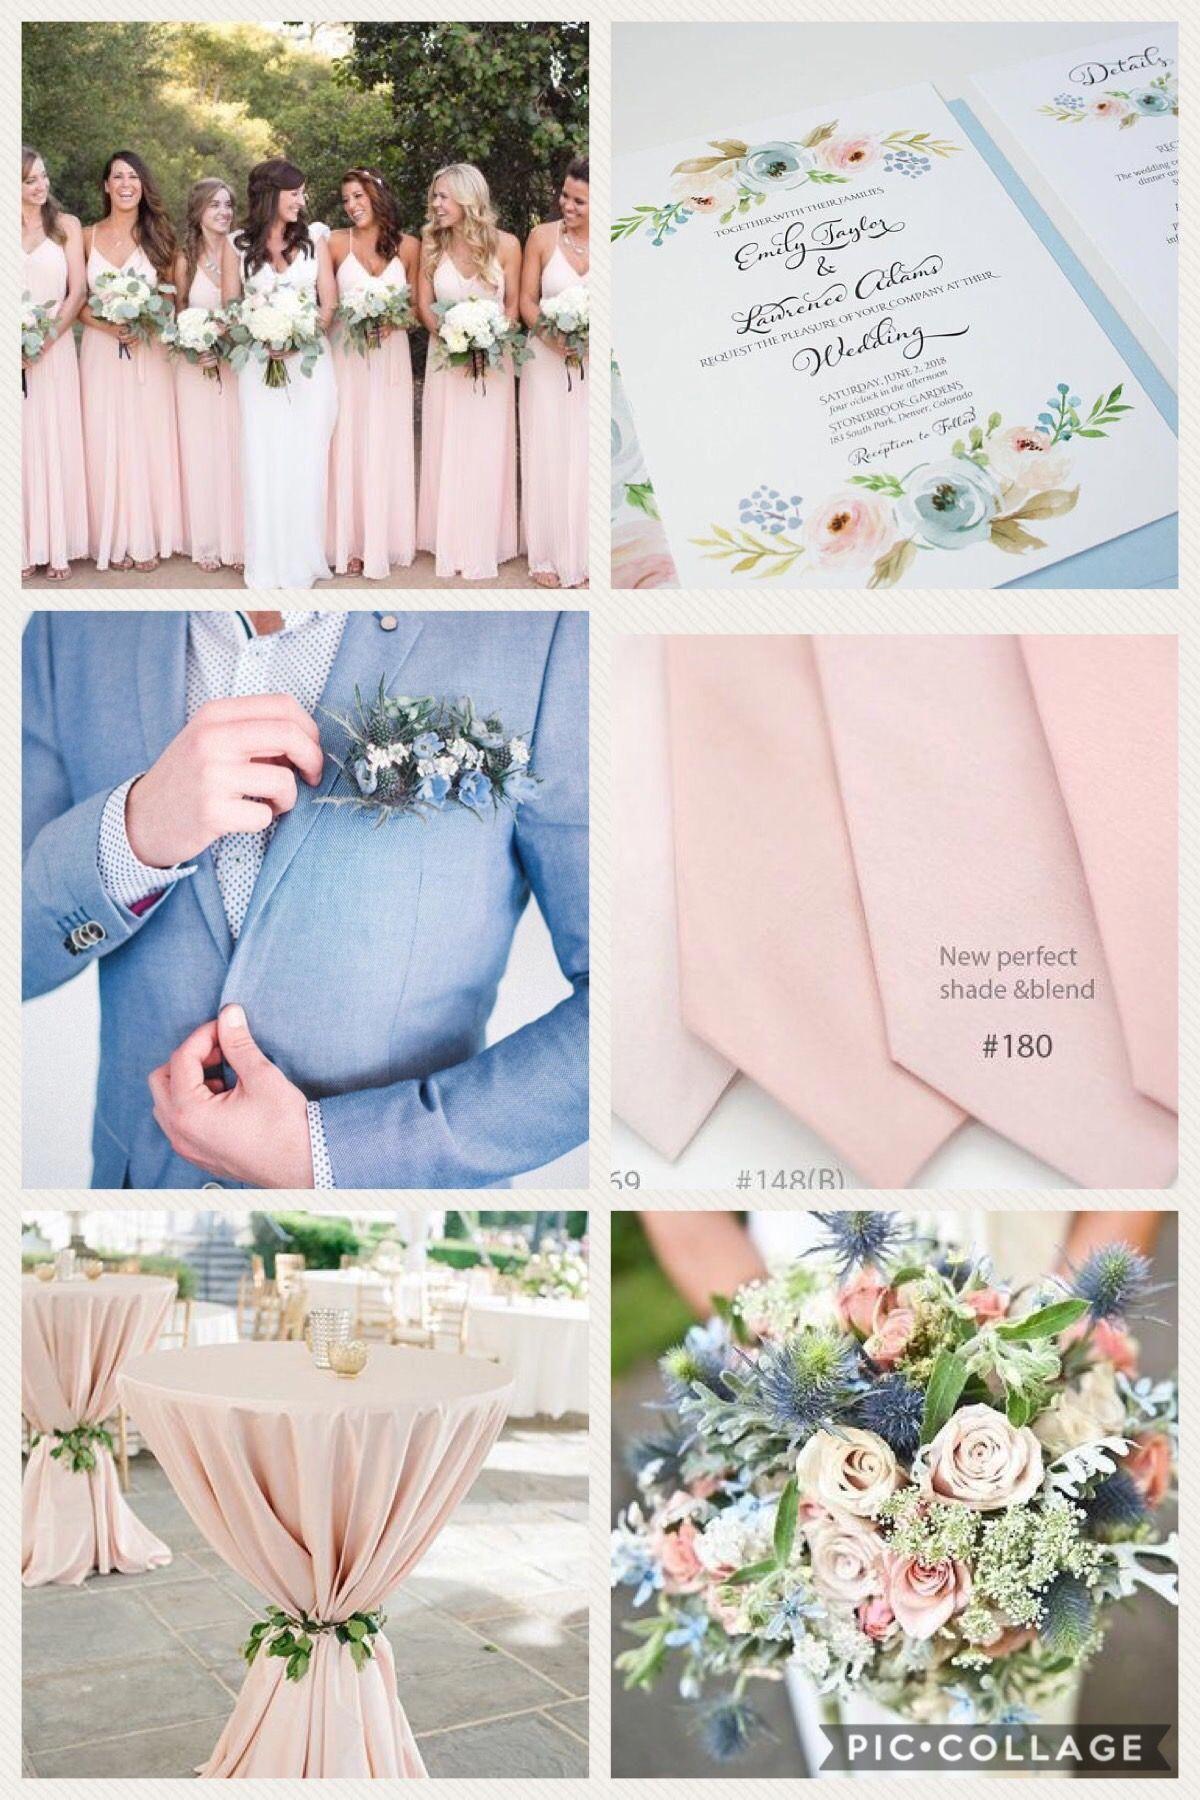 Dusty Blue Blush And Green Wedding Colors Elegant Spring Wedding Ideas Pink Wedding Theme Summer Wedding Colors